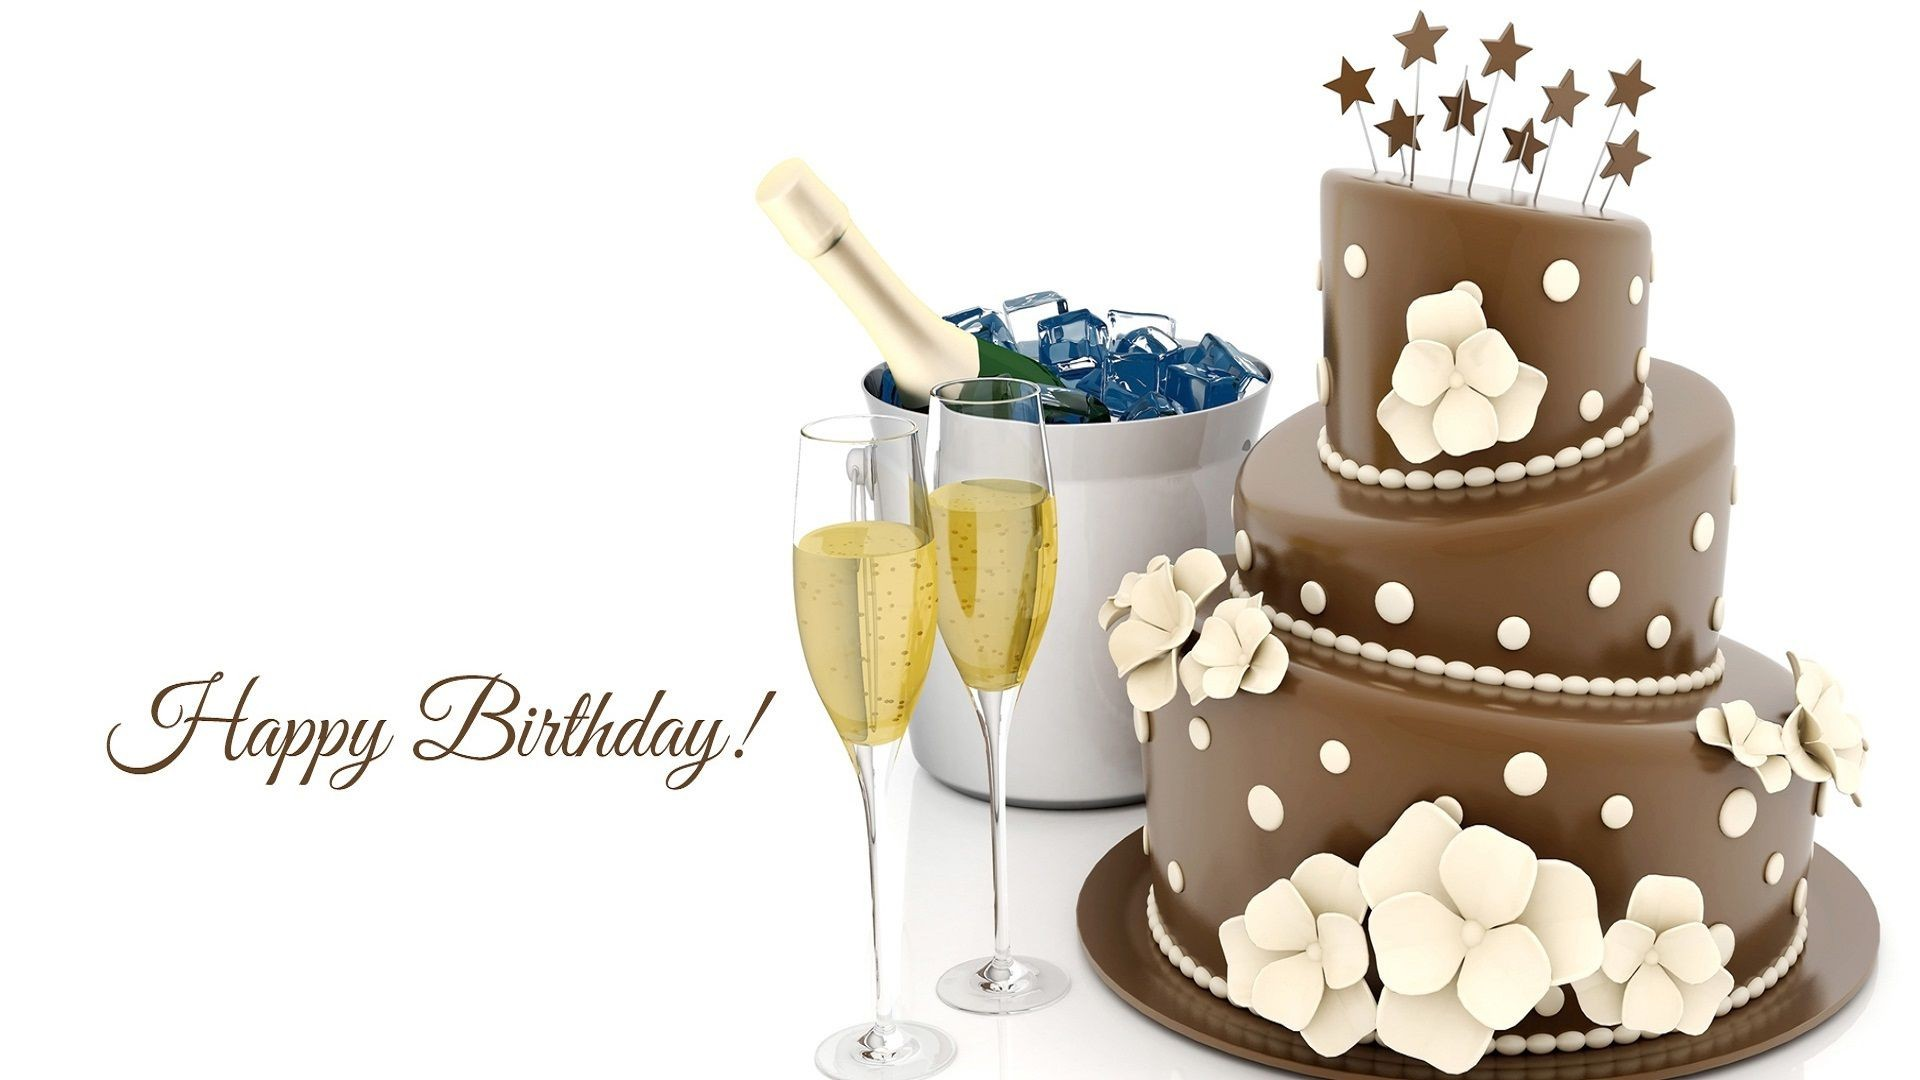 Birthday Cake 1080p picture